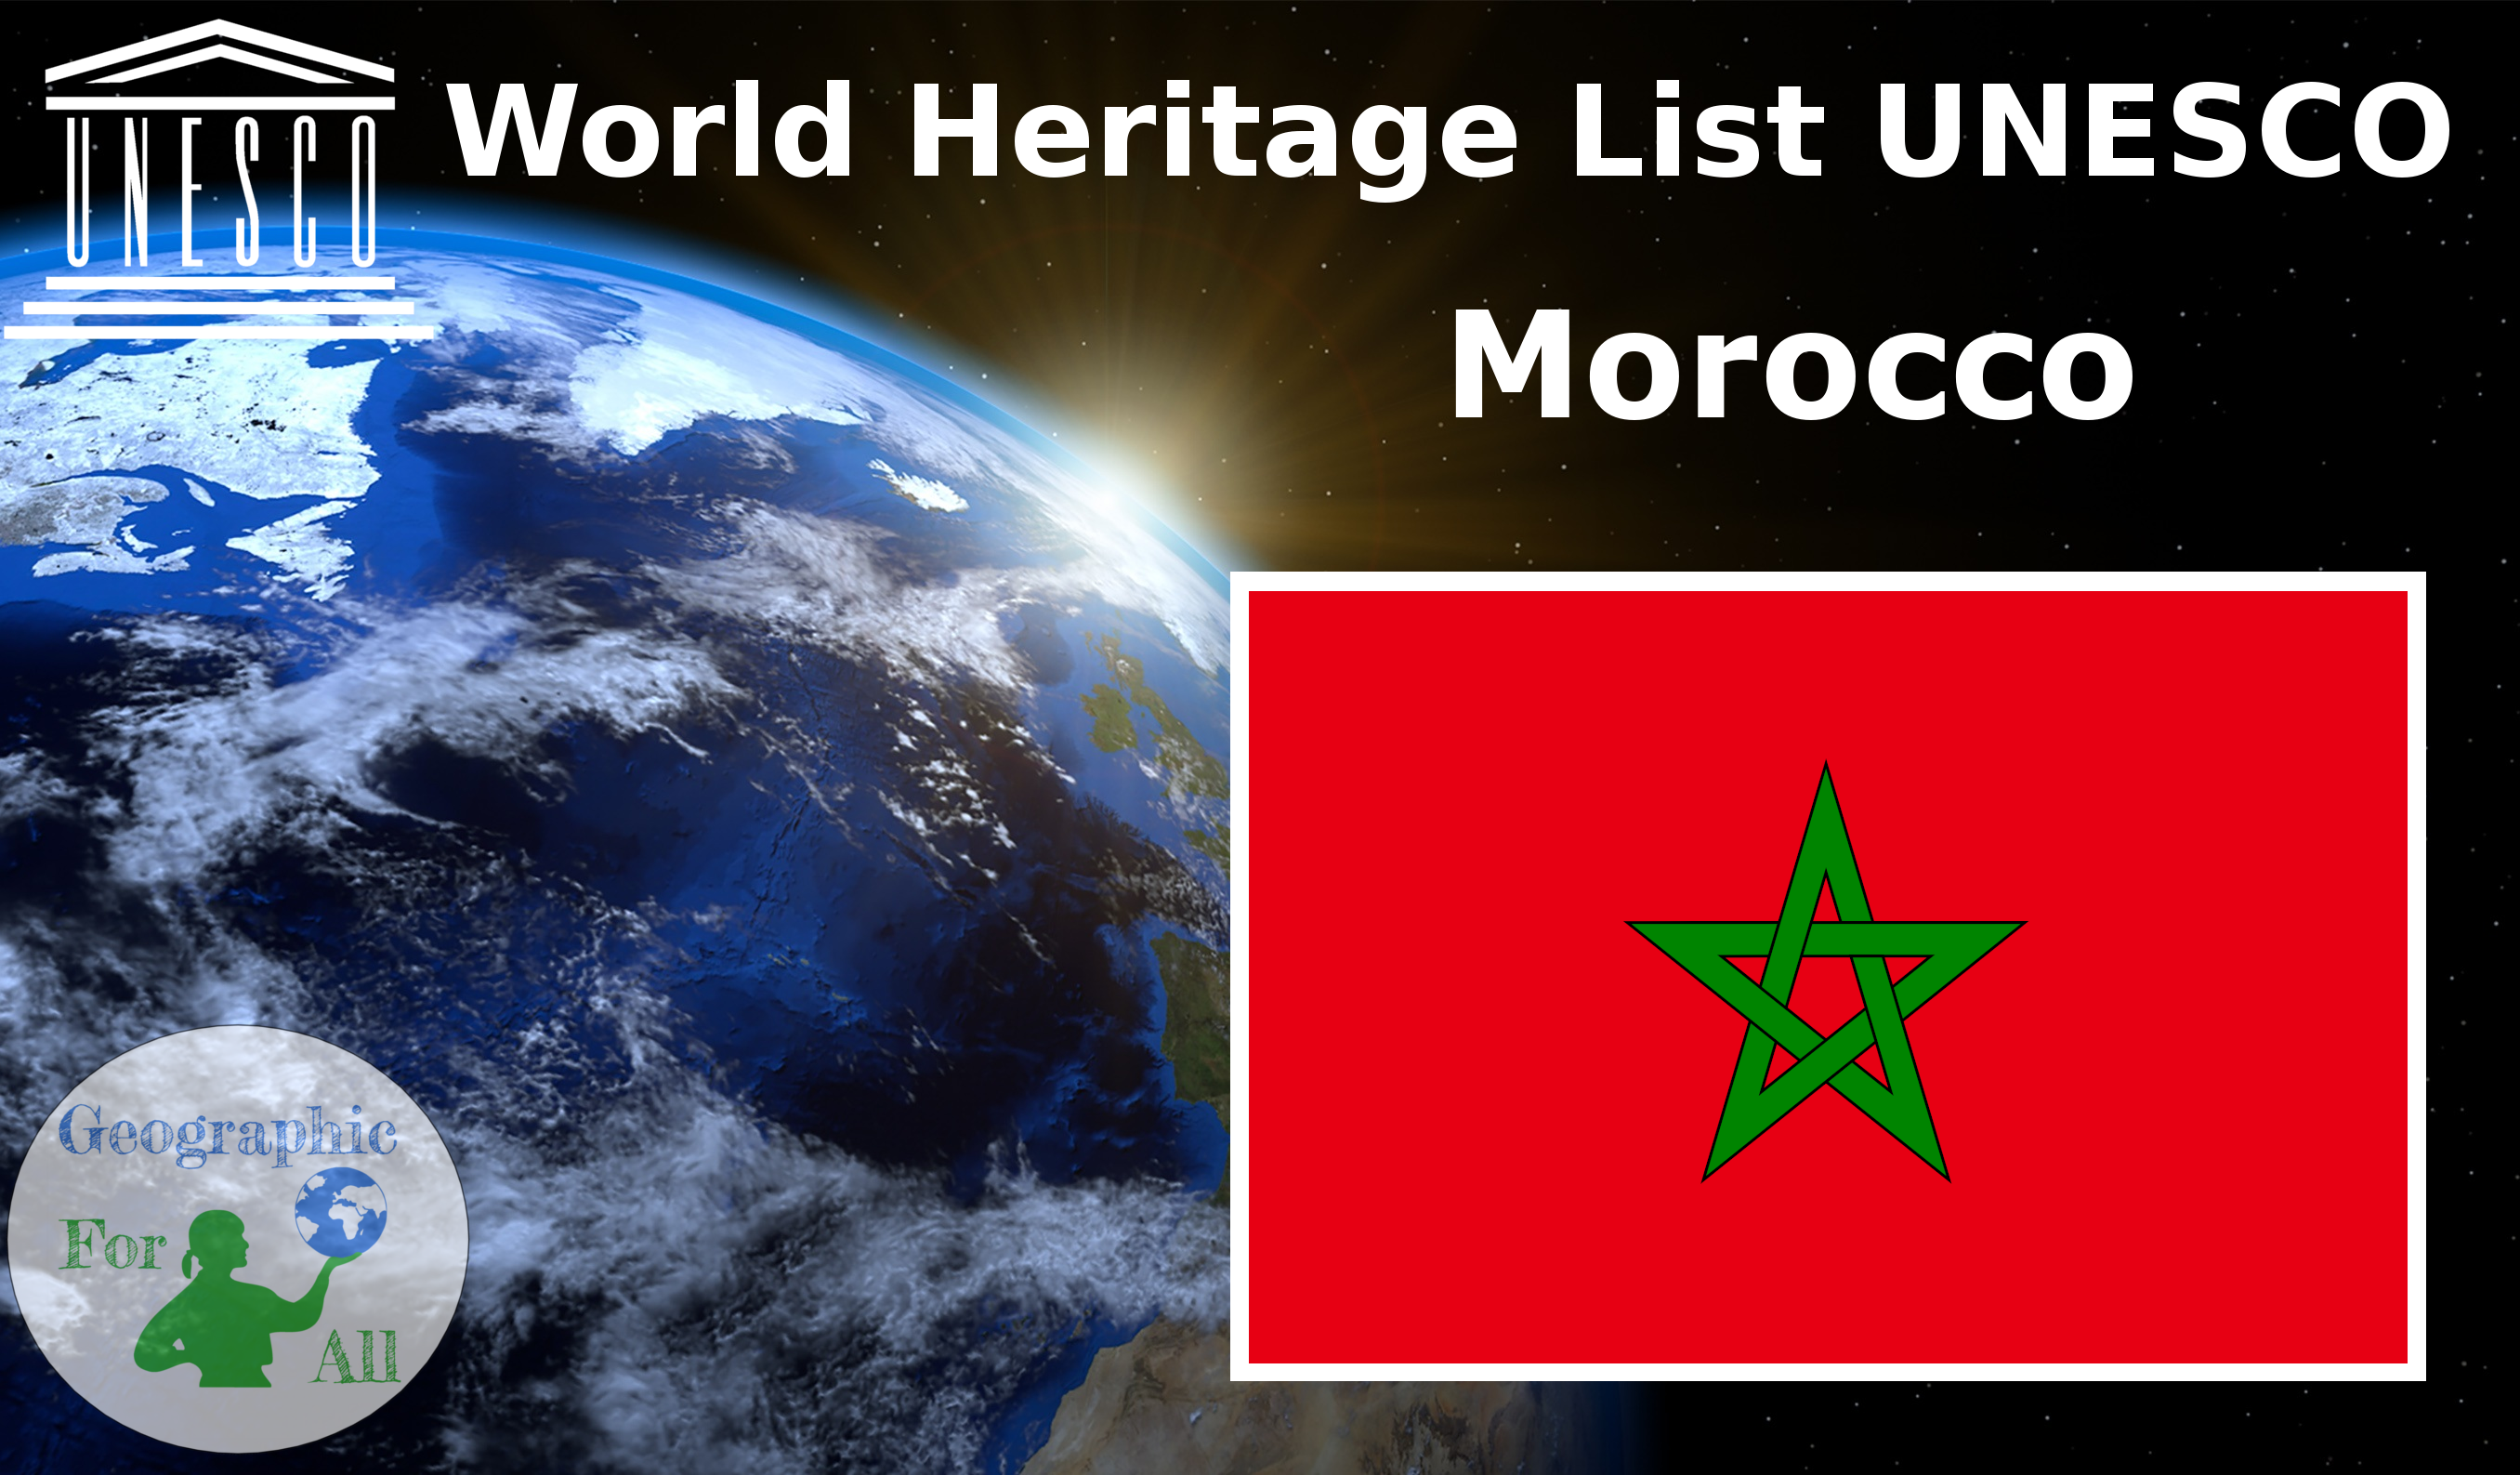 World Heritage List UNESCO - Morocco